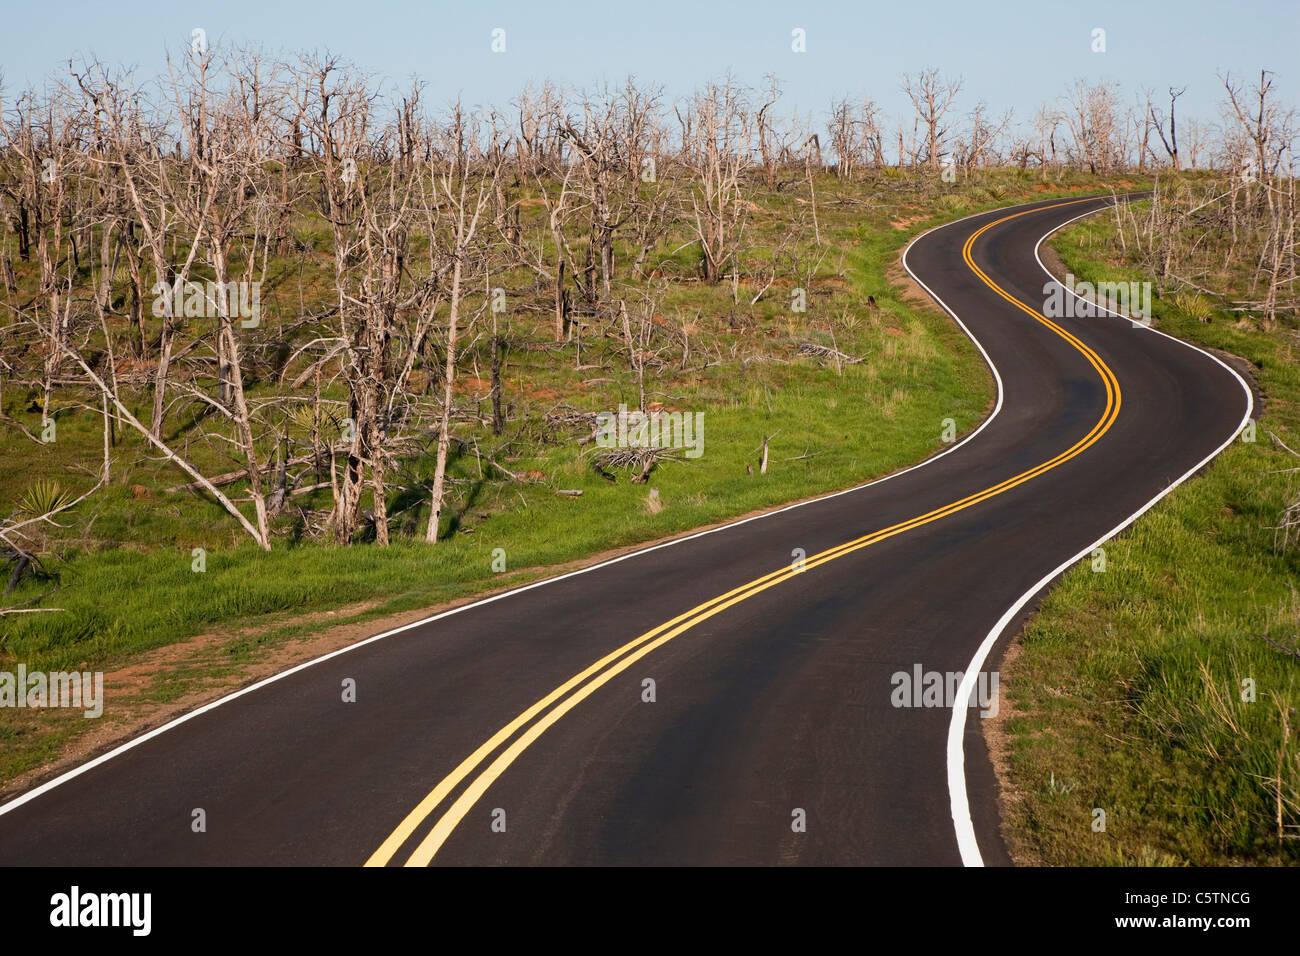 USA, Colorado, Mesa Verde Nationalpark, Empty road winding through landscape - Stock Image